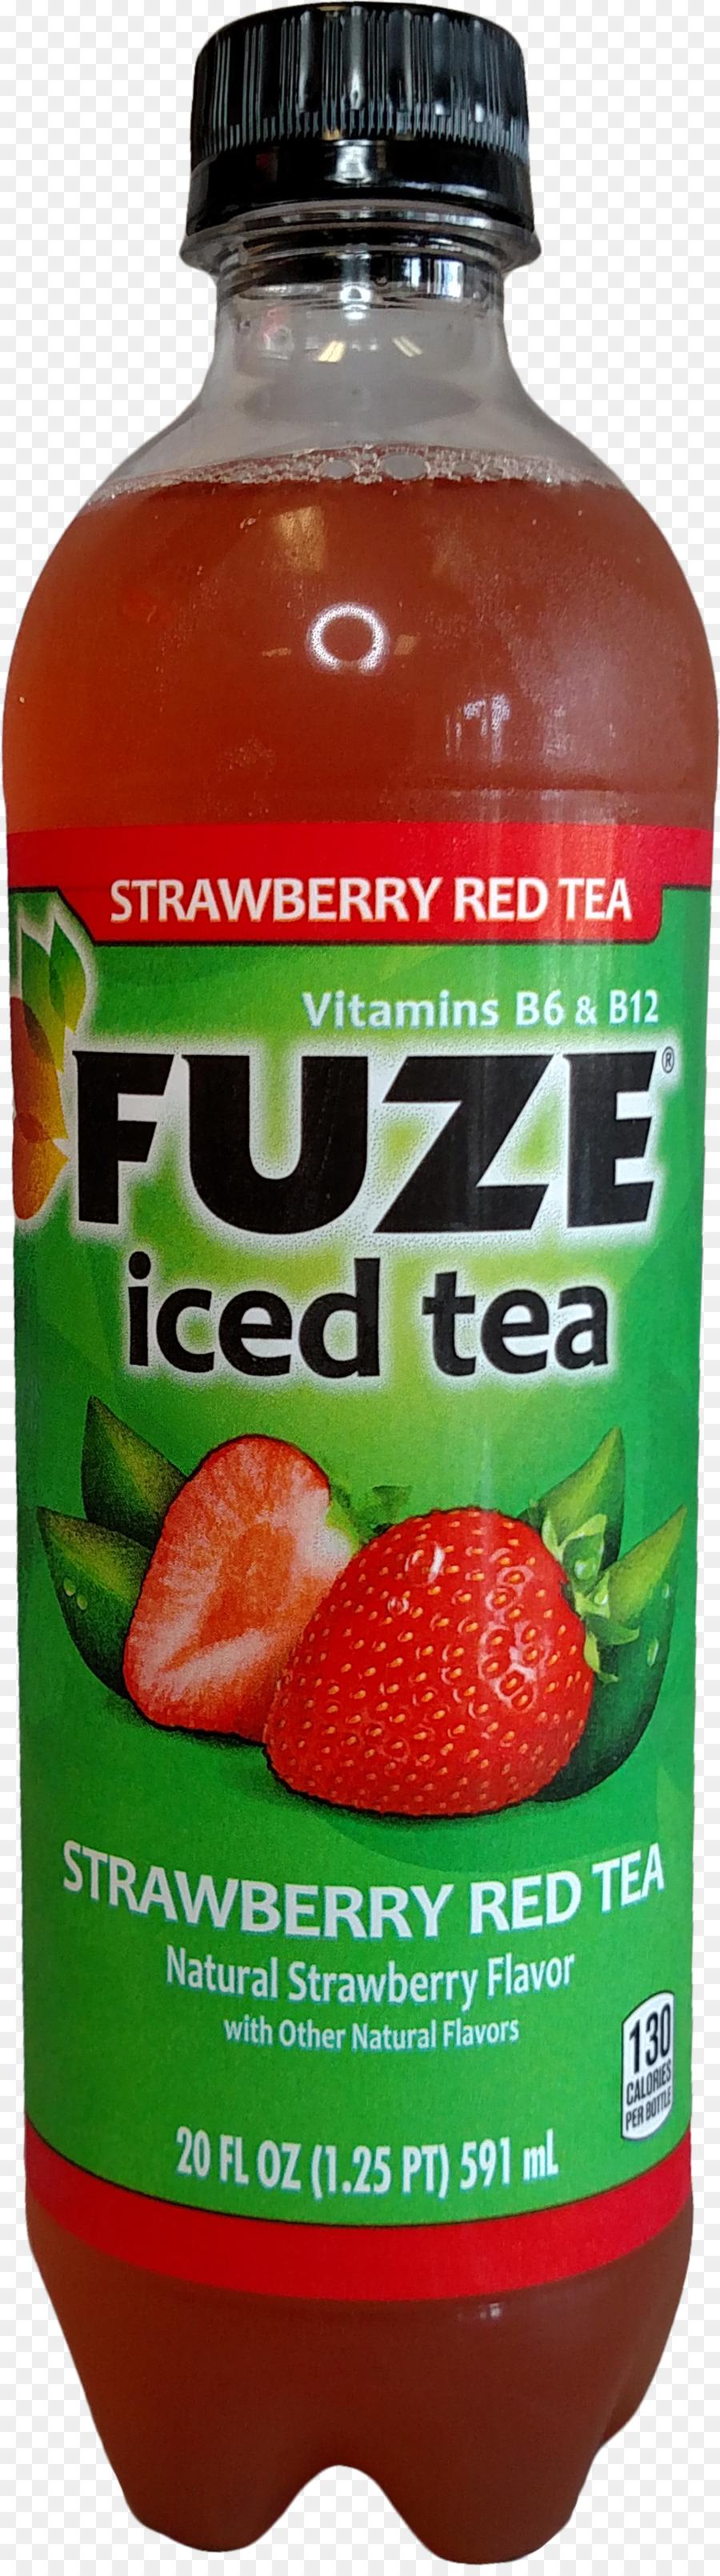 963*3431 - Free Transparent Iced Tea